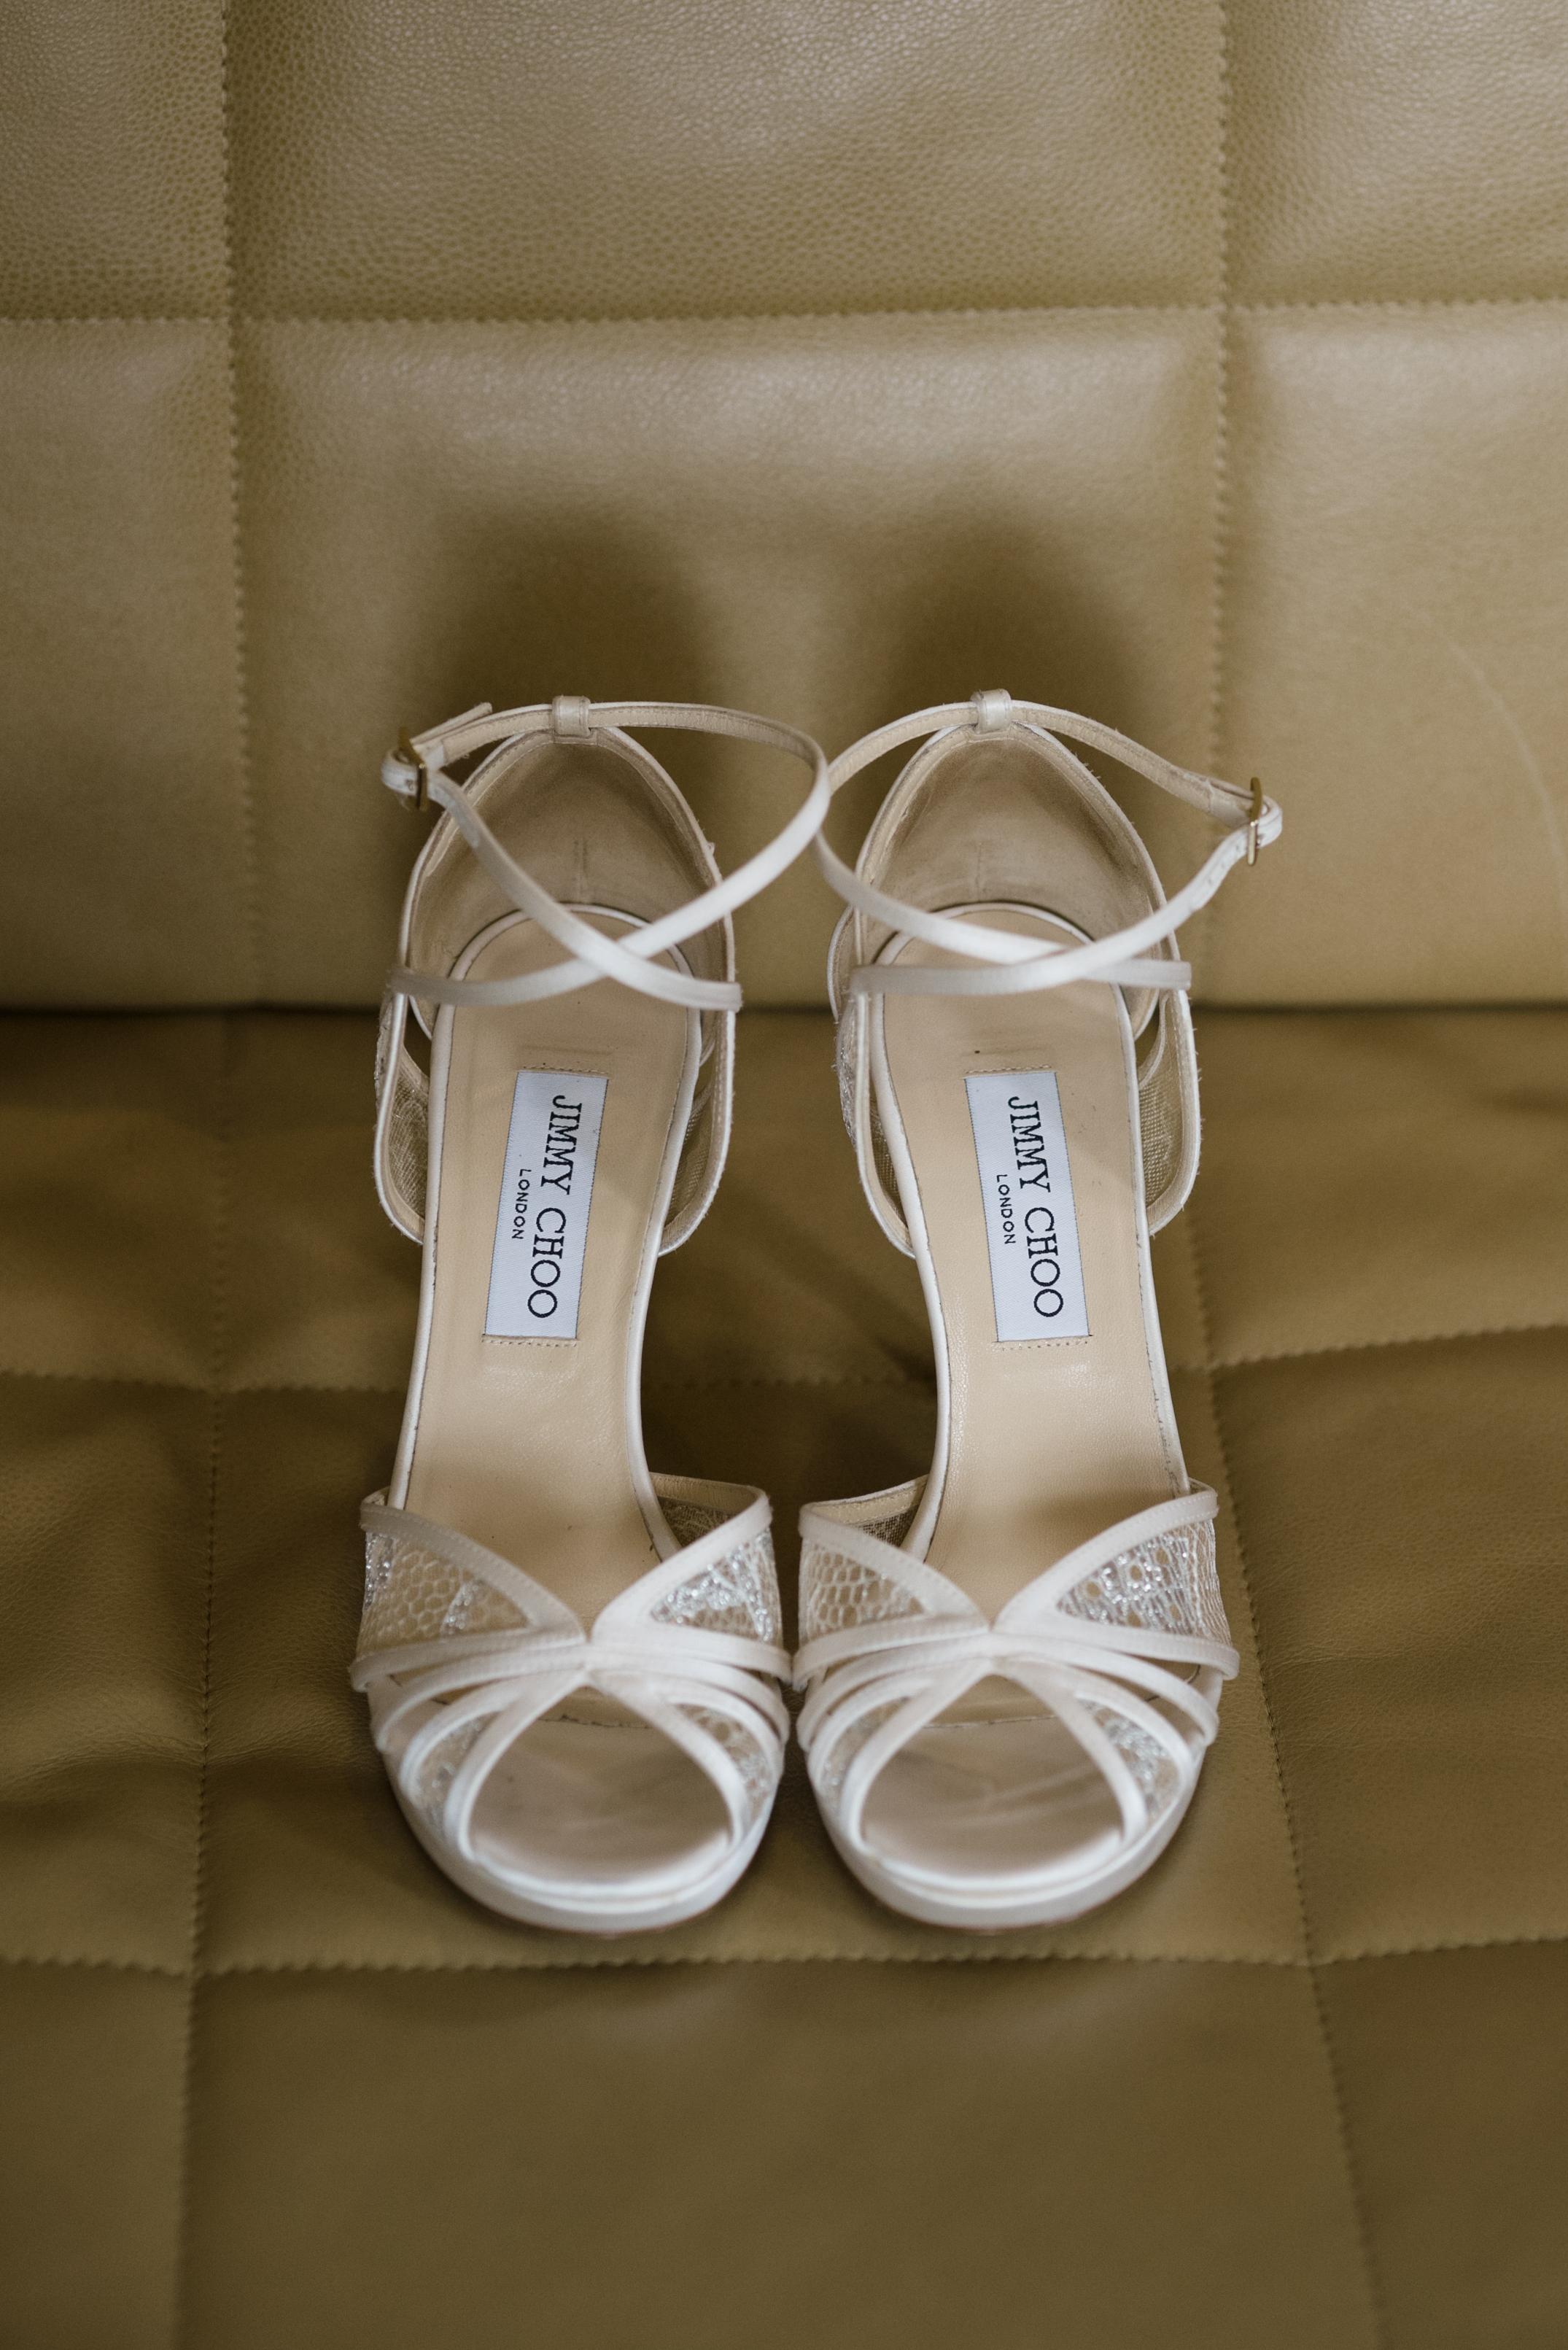 Shoe Details - Dallas, Tx - Spring Wedding - Julian Leaver Events